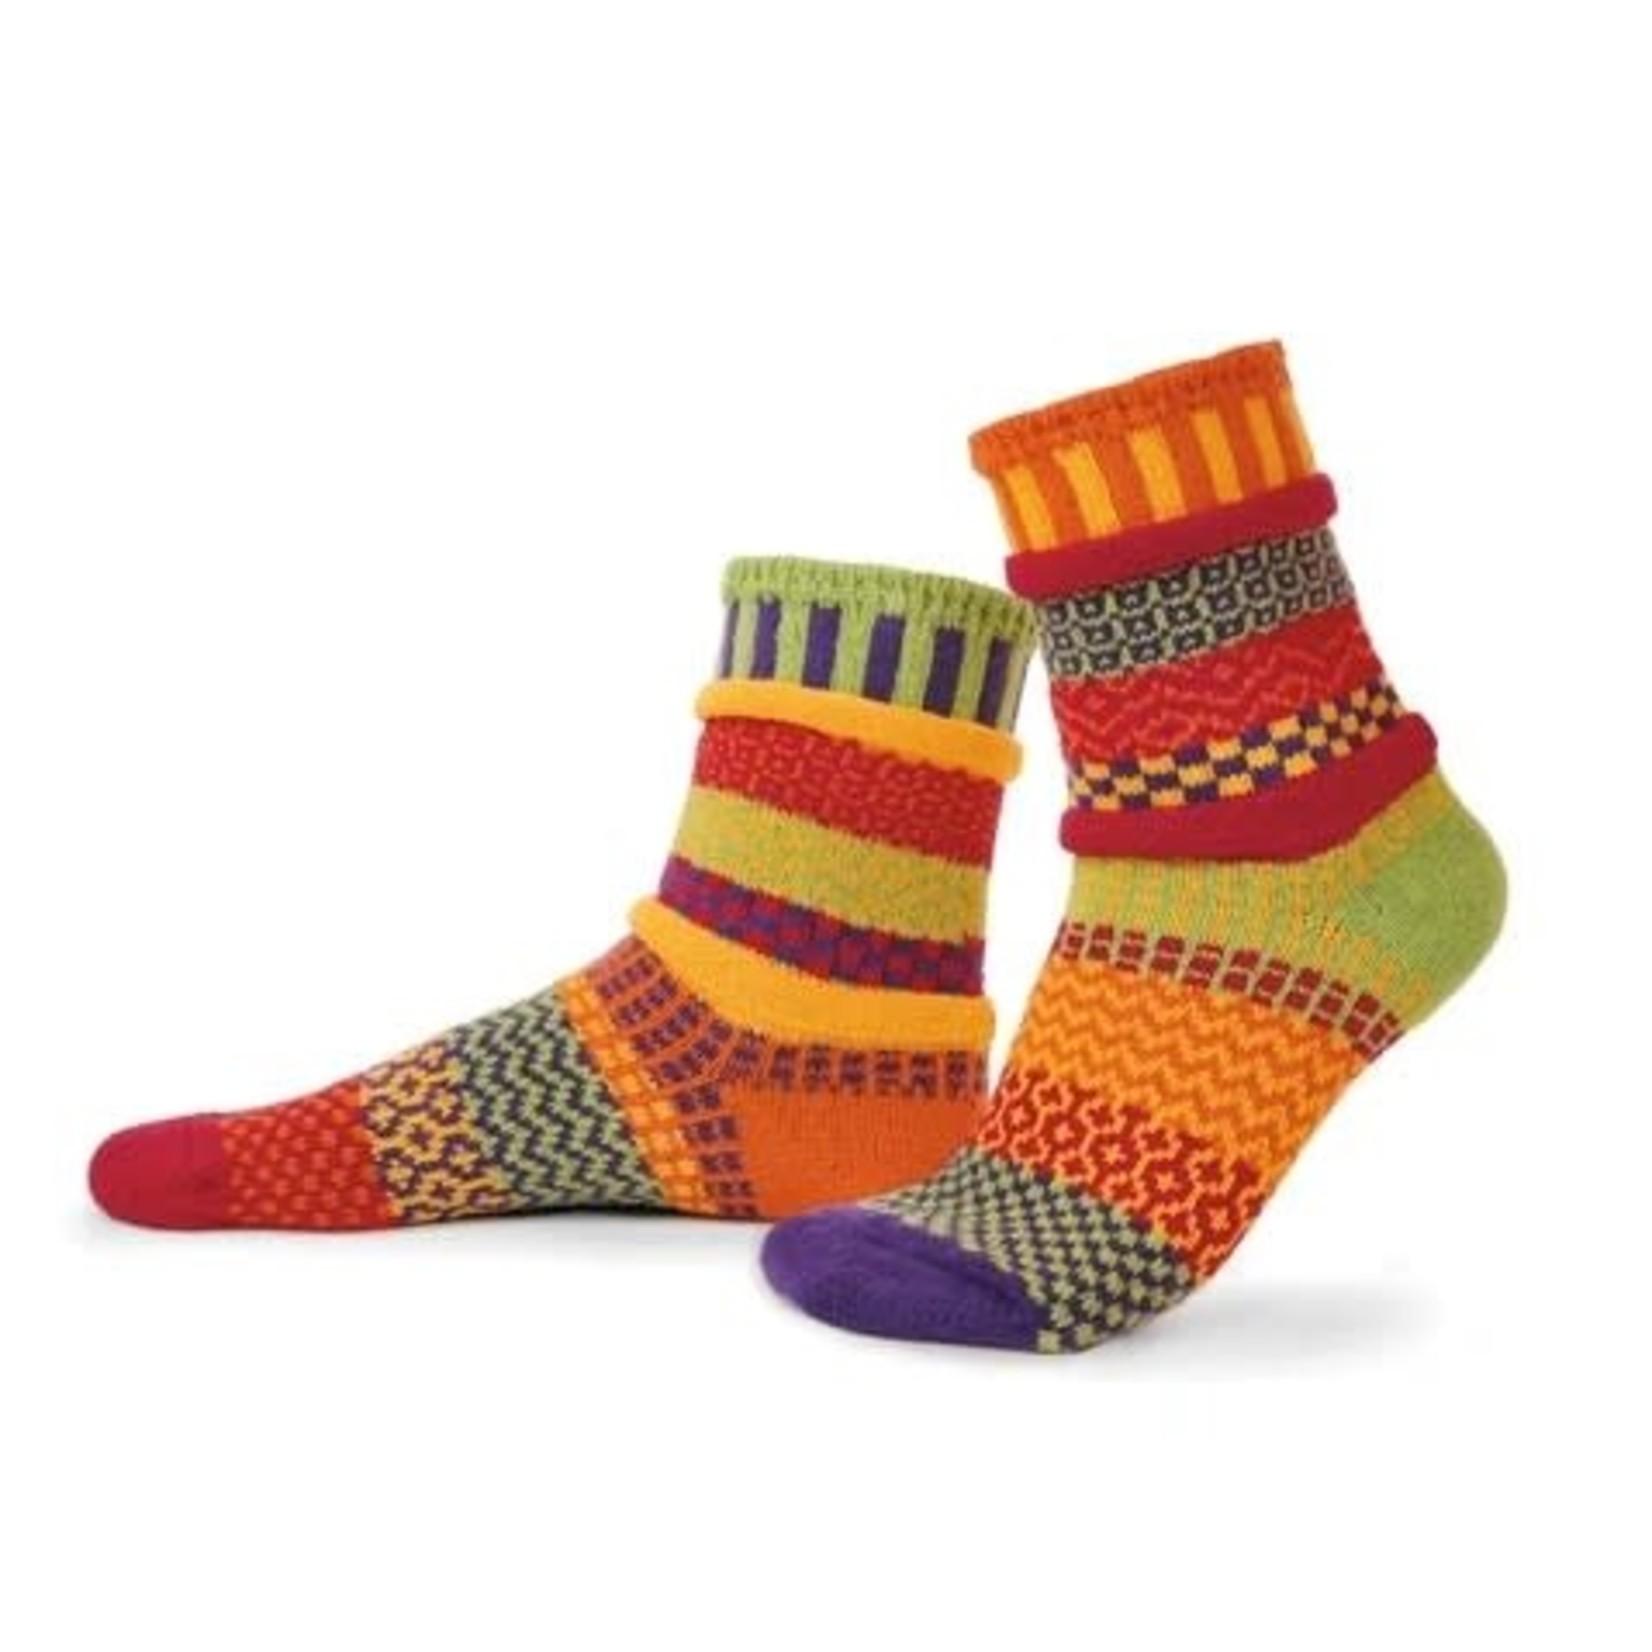 Solmates Solmate Socks Adult Crew